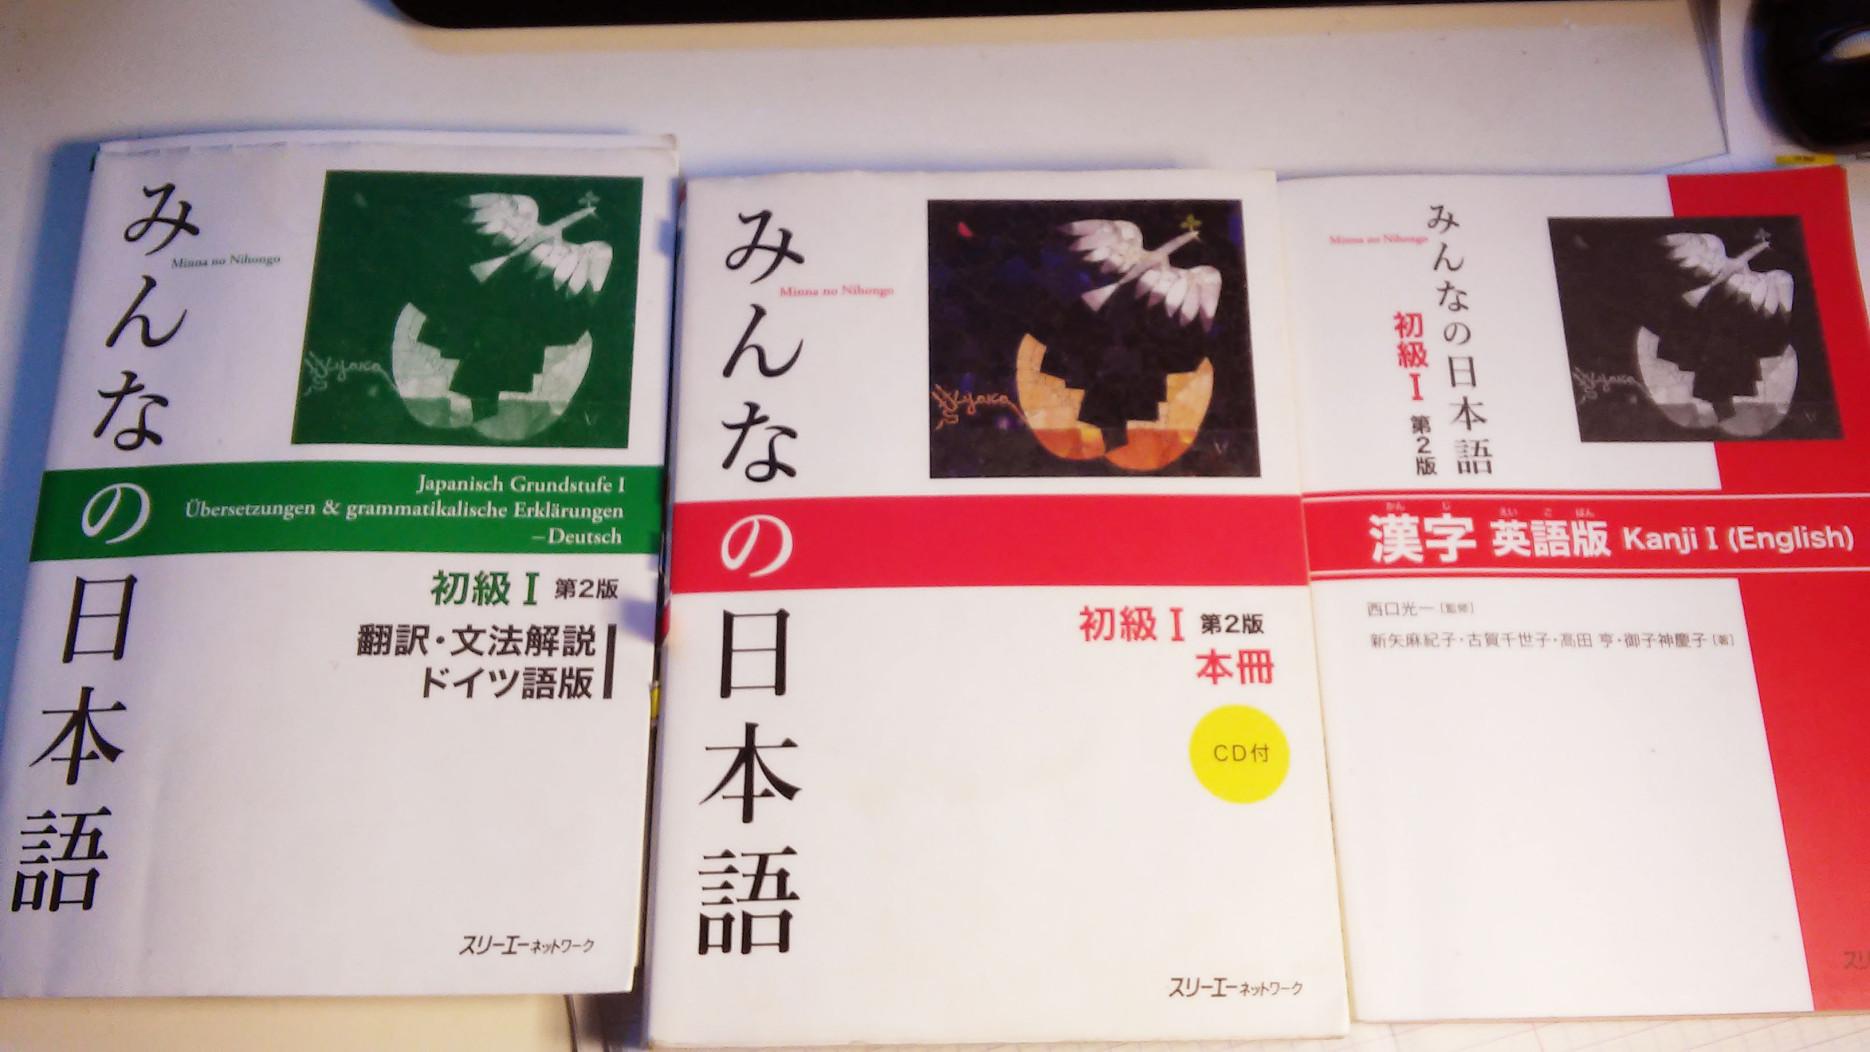 A WEEK OF JAPANESE AT HEINRICH HEINE UNIVERSITY – PART II